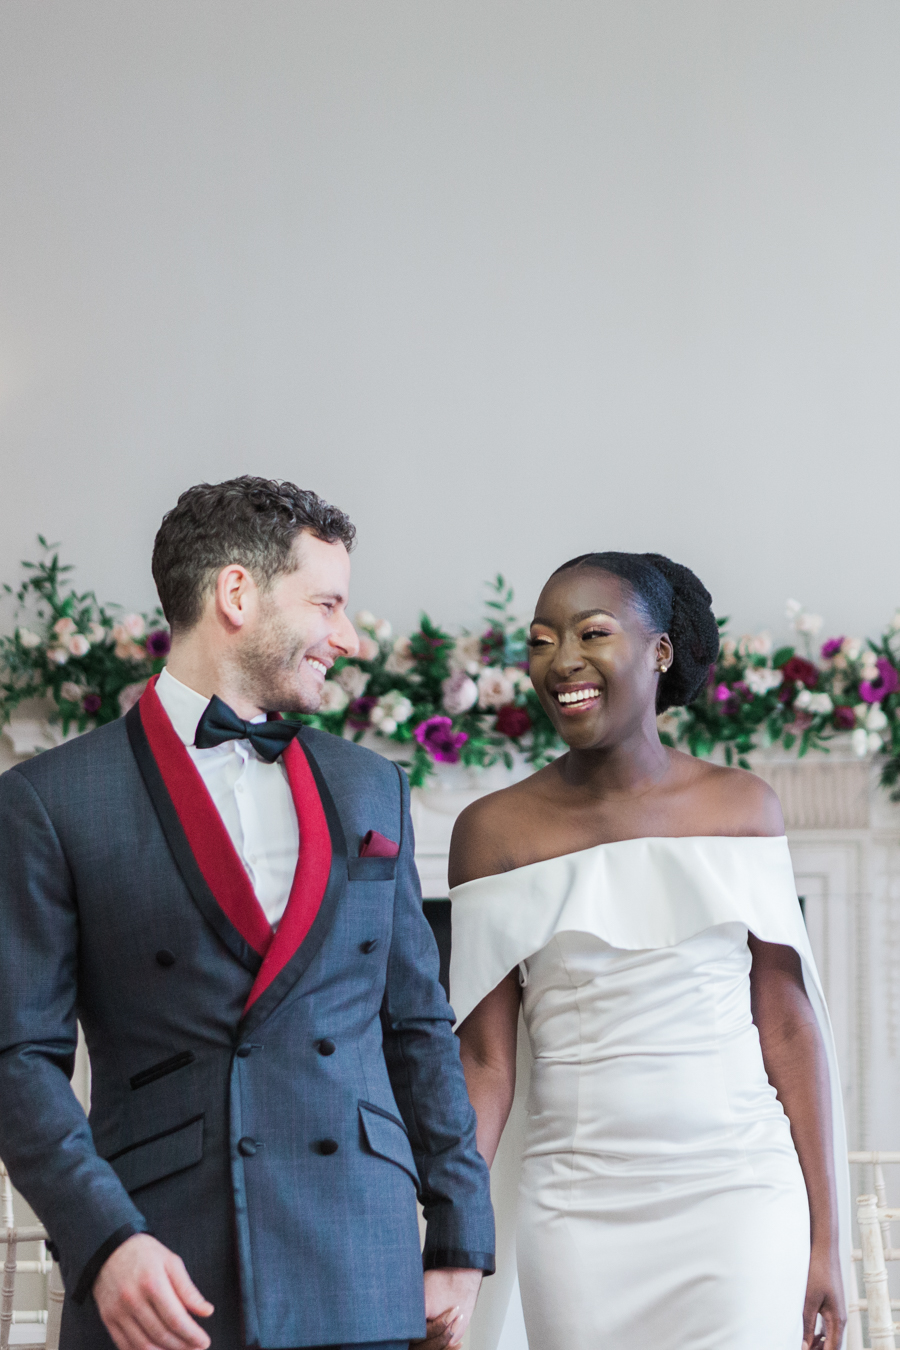 Breathtakingly beautiful - diversity wins in this stunning RSA London wedding editorial! (32)